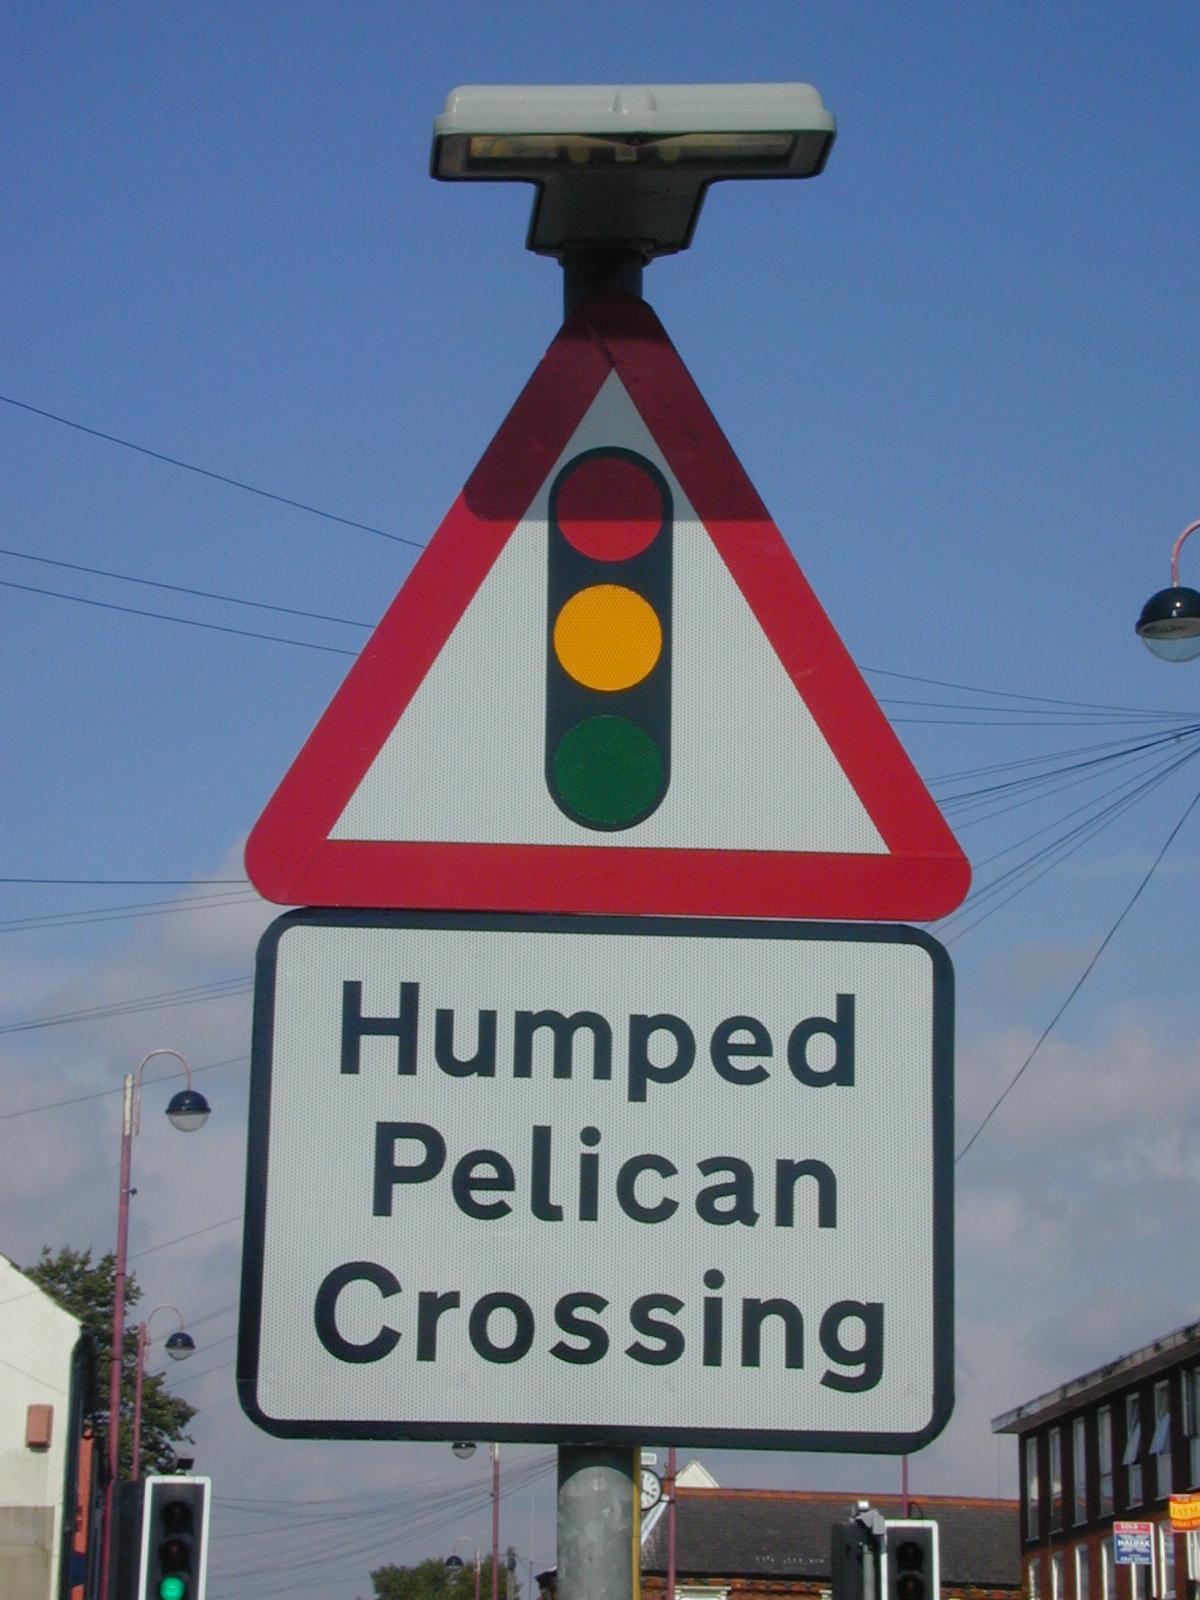 Humped Pelican Crossing road sign